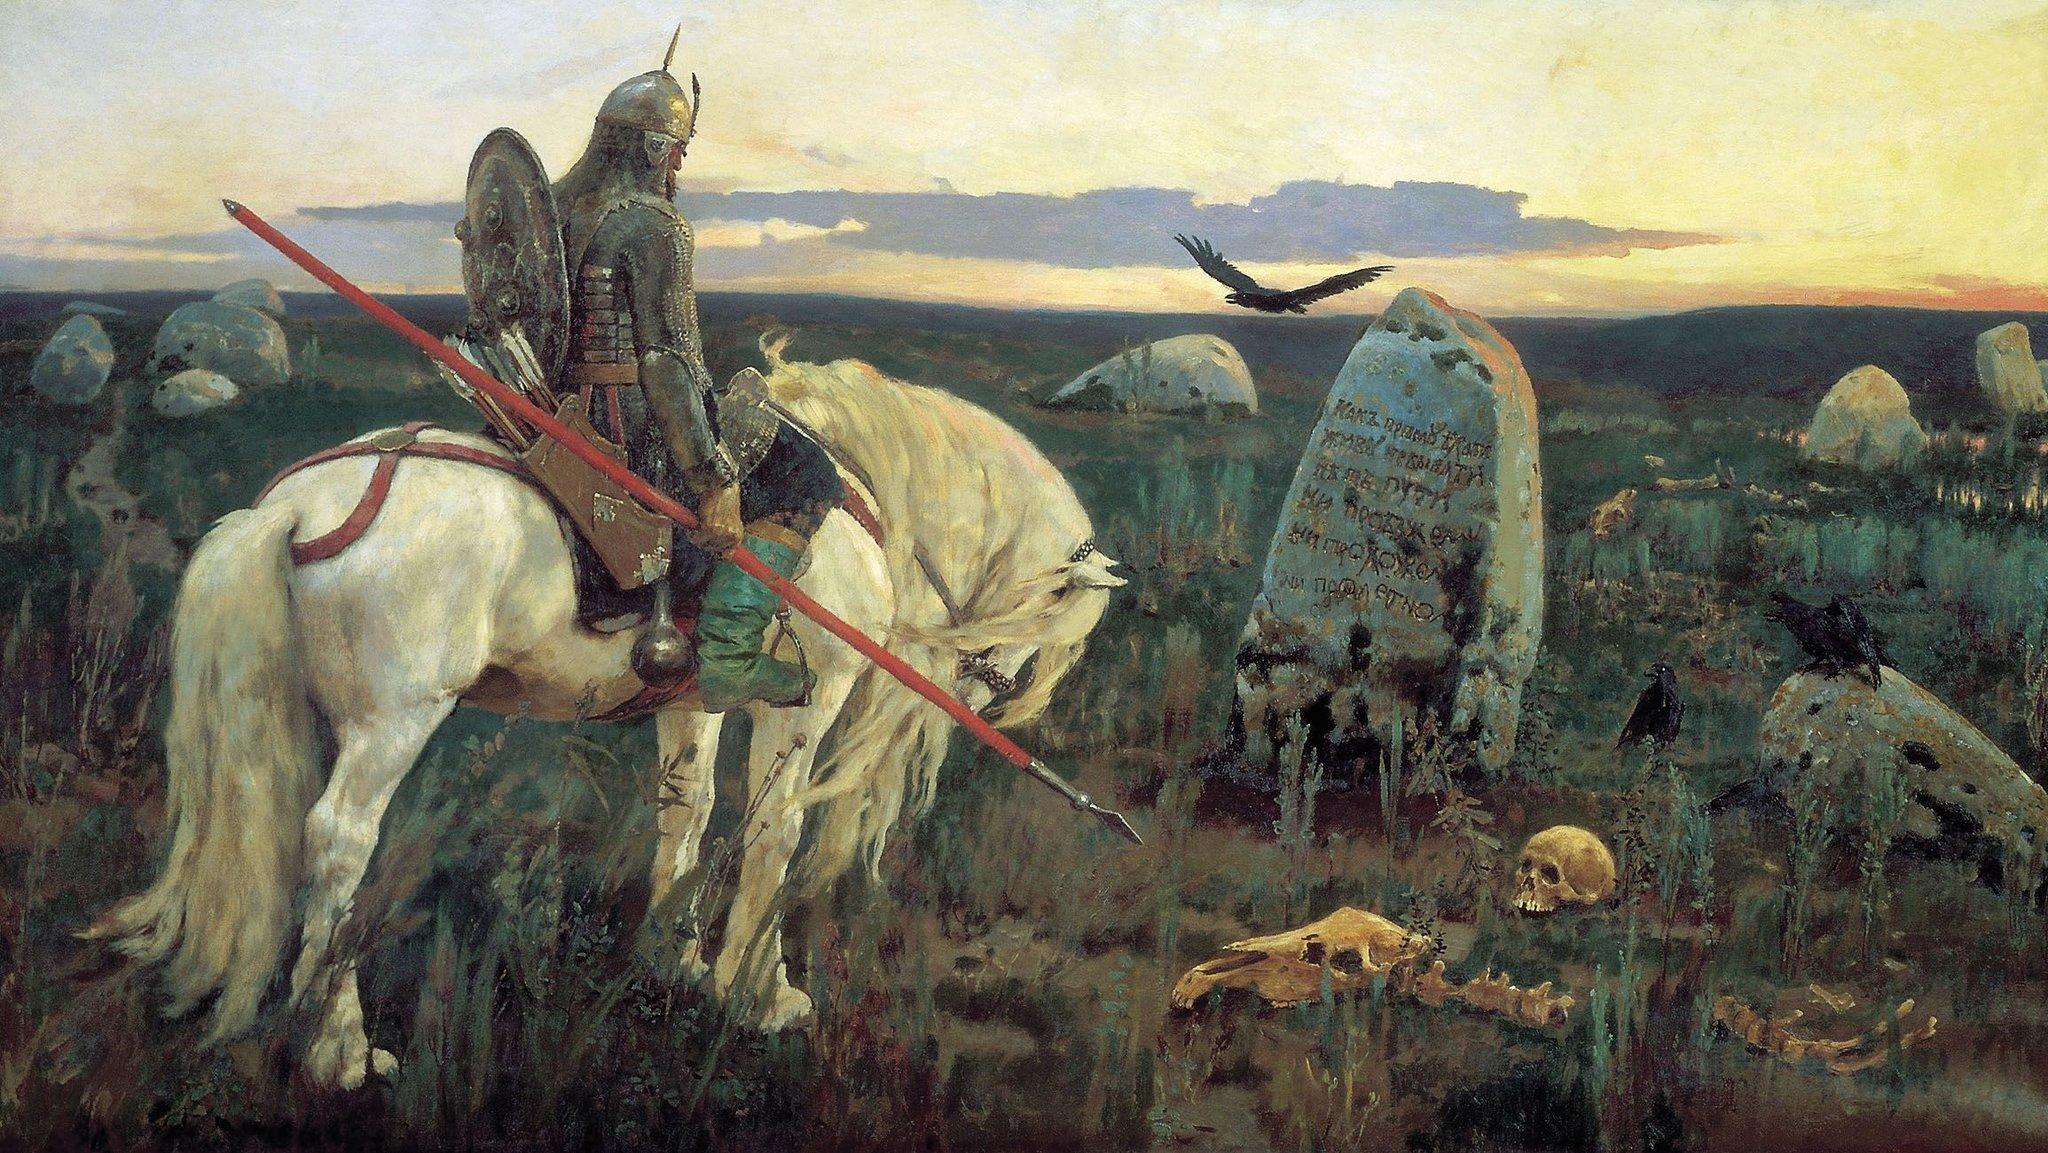 Васнецов Виктор. Витязь на распутье. 1882.